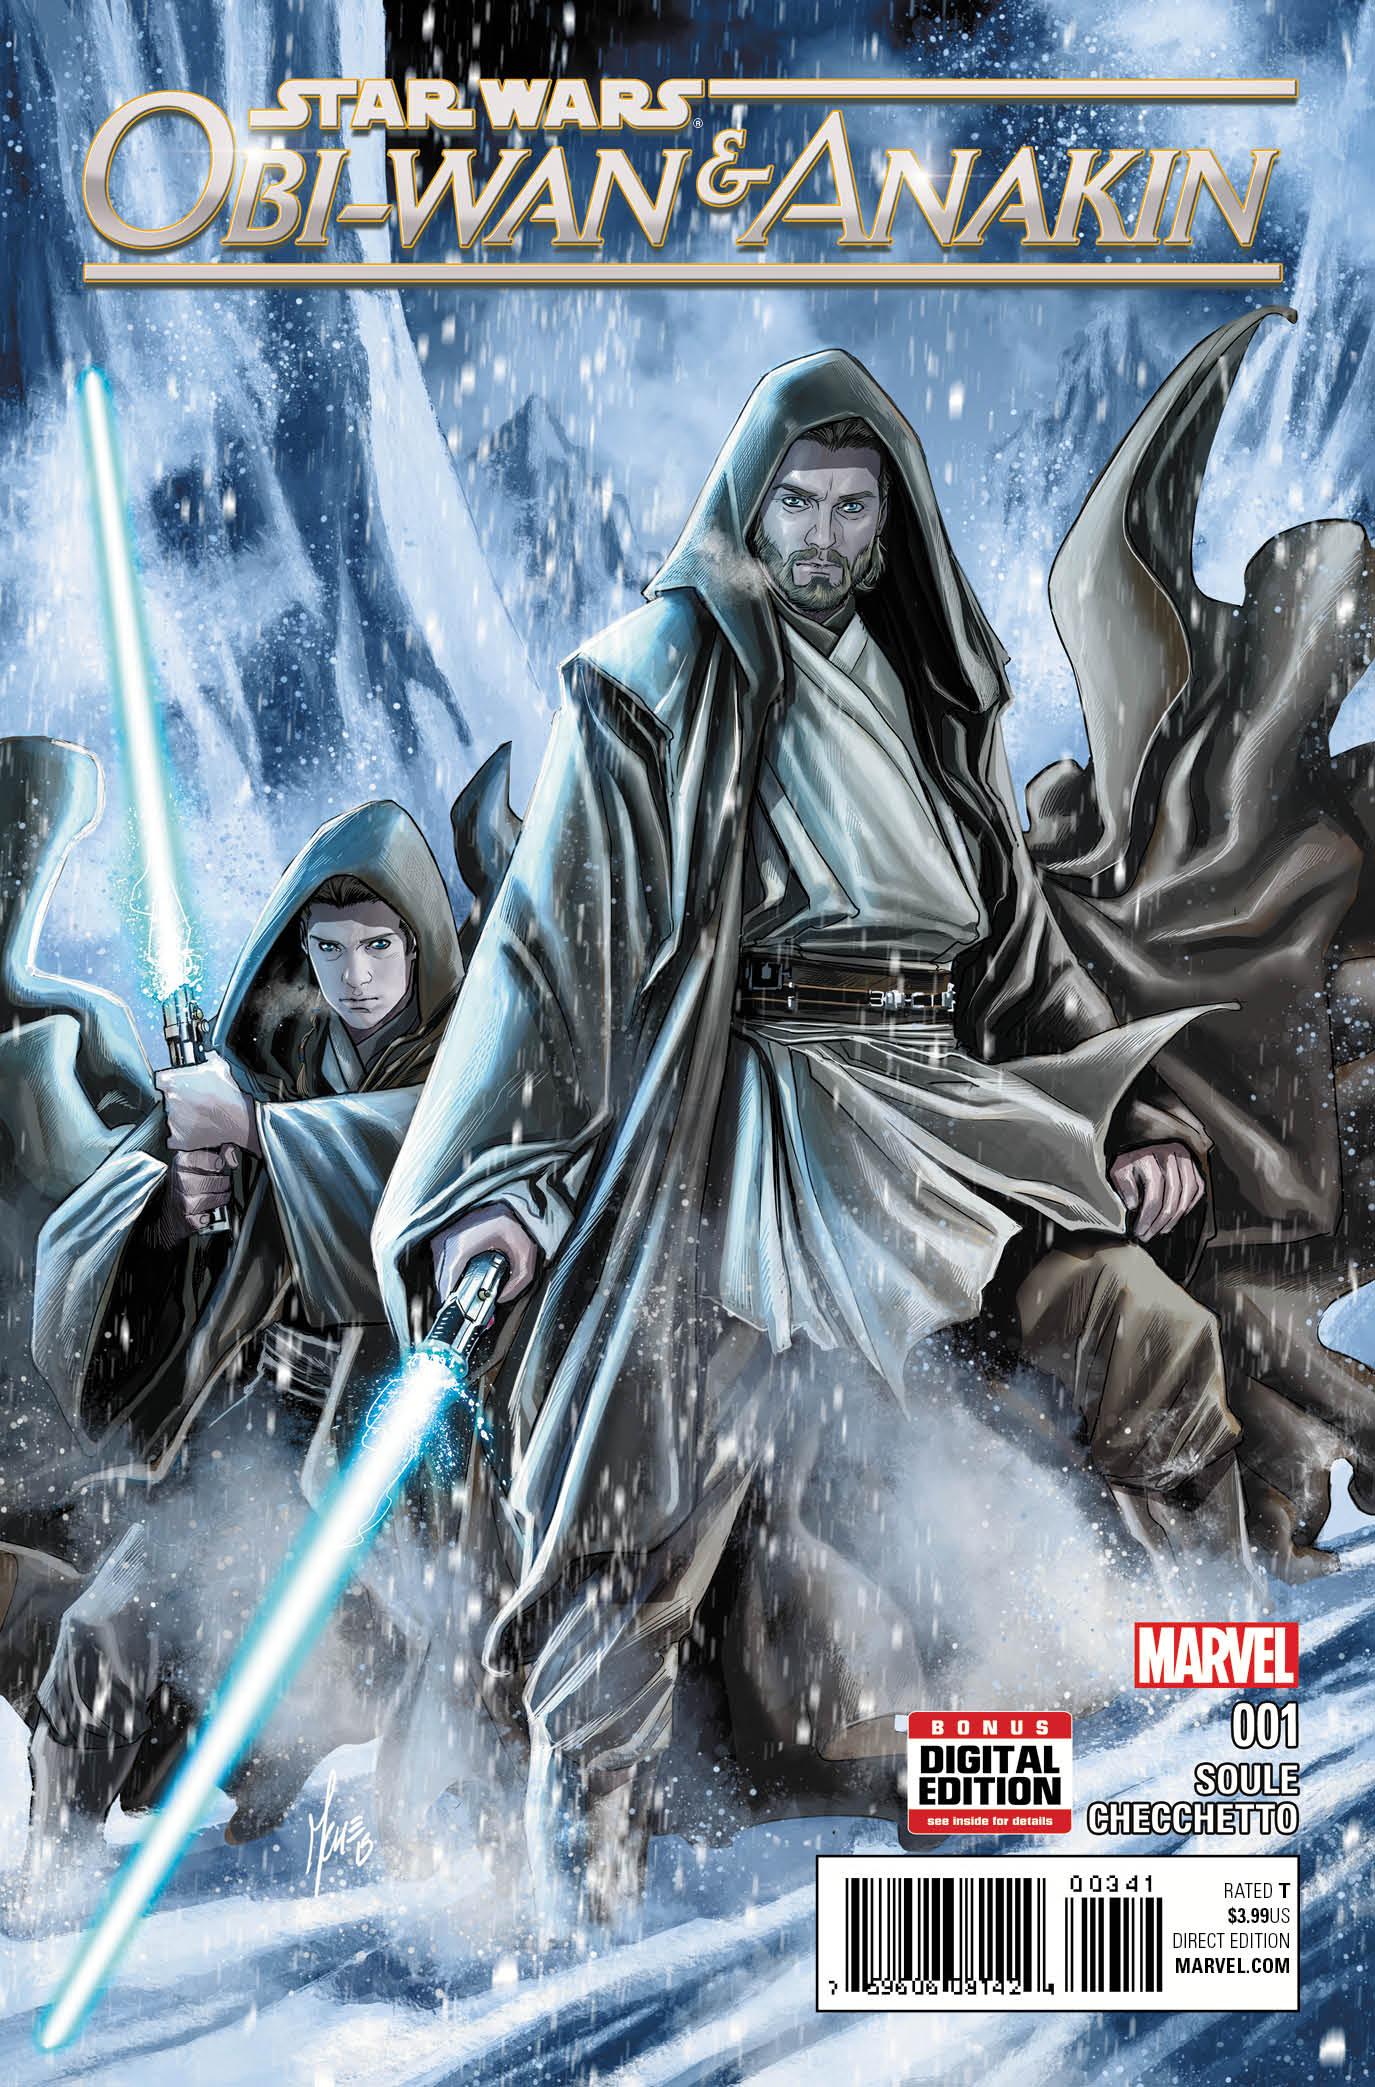 100% Star Wars Obi-Wan et Anakin Couverture